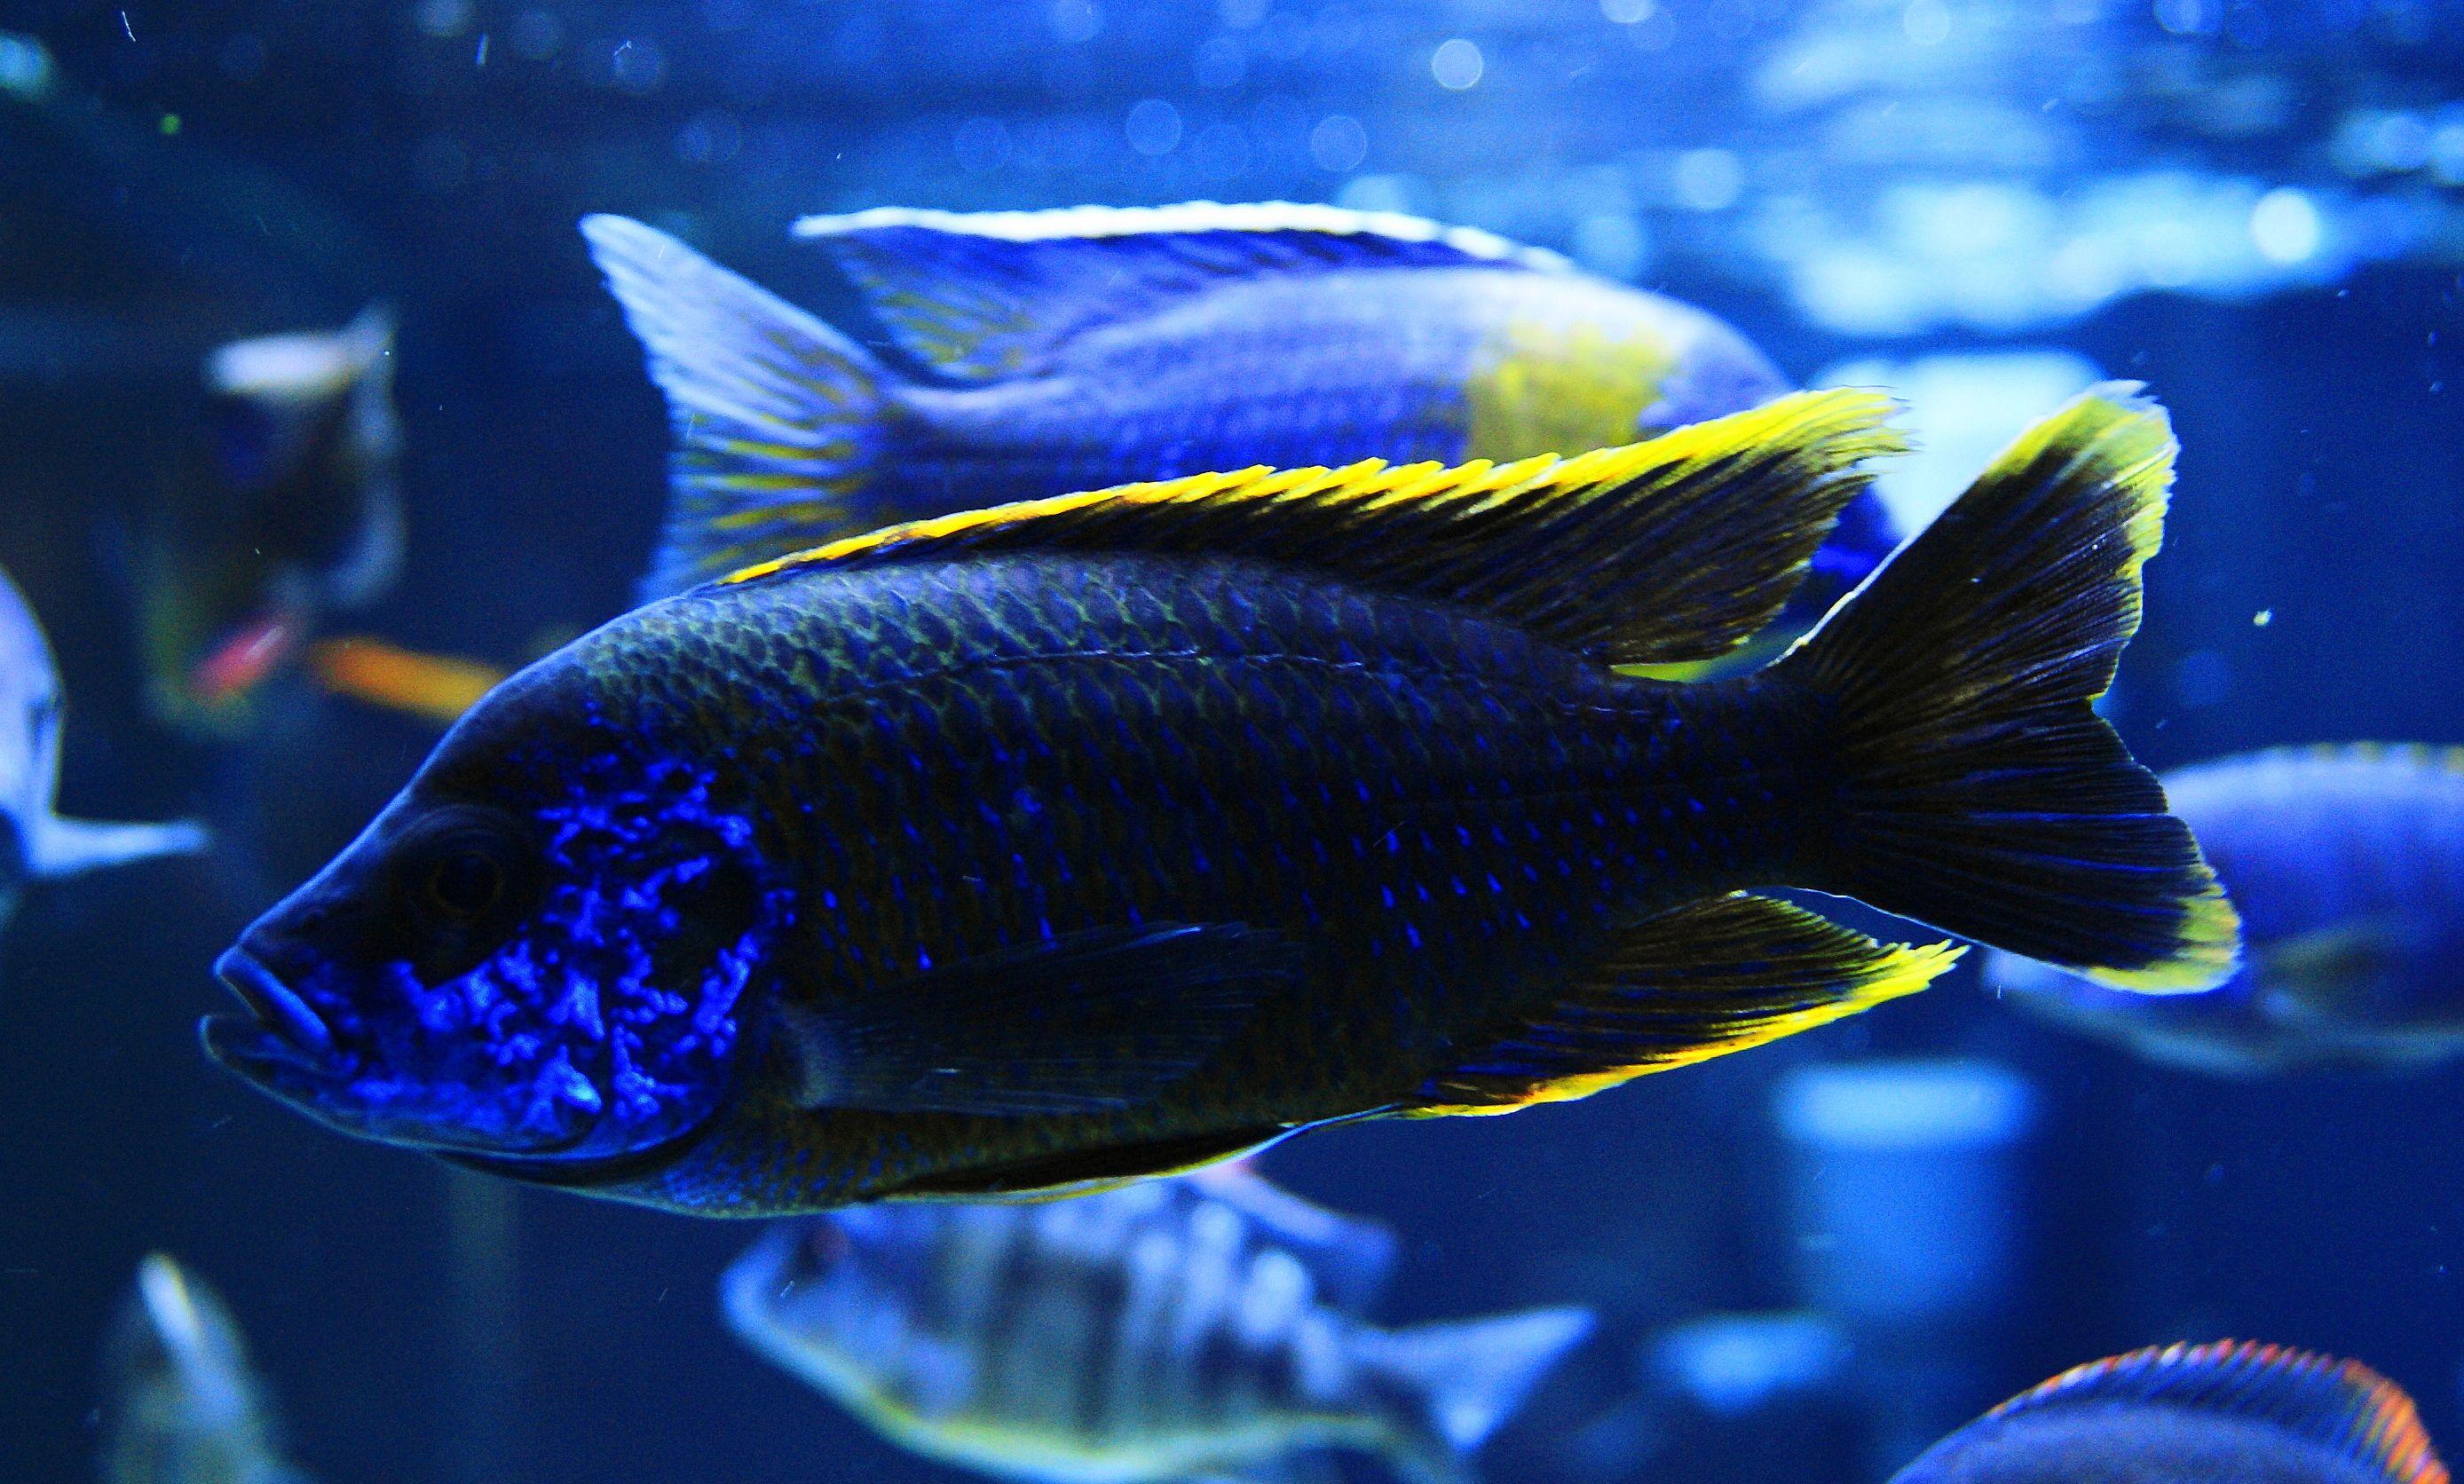 1d0d429787fd6b3505538349321a6cbf Frais De Aquarium Tropical Schème